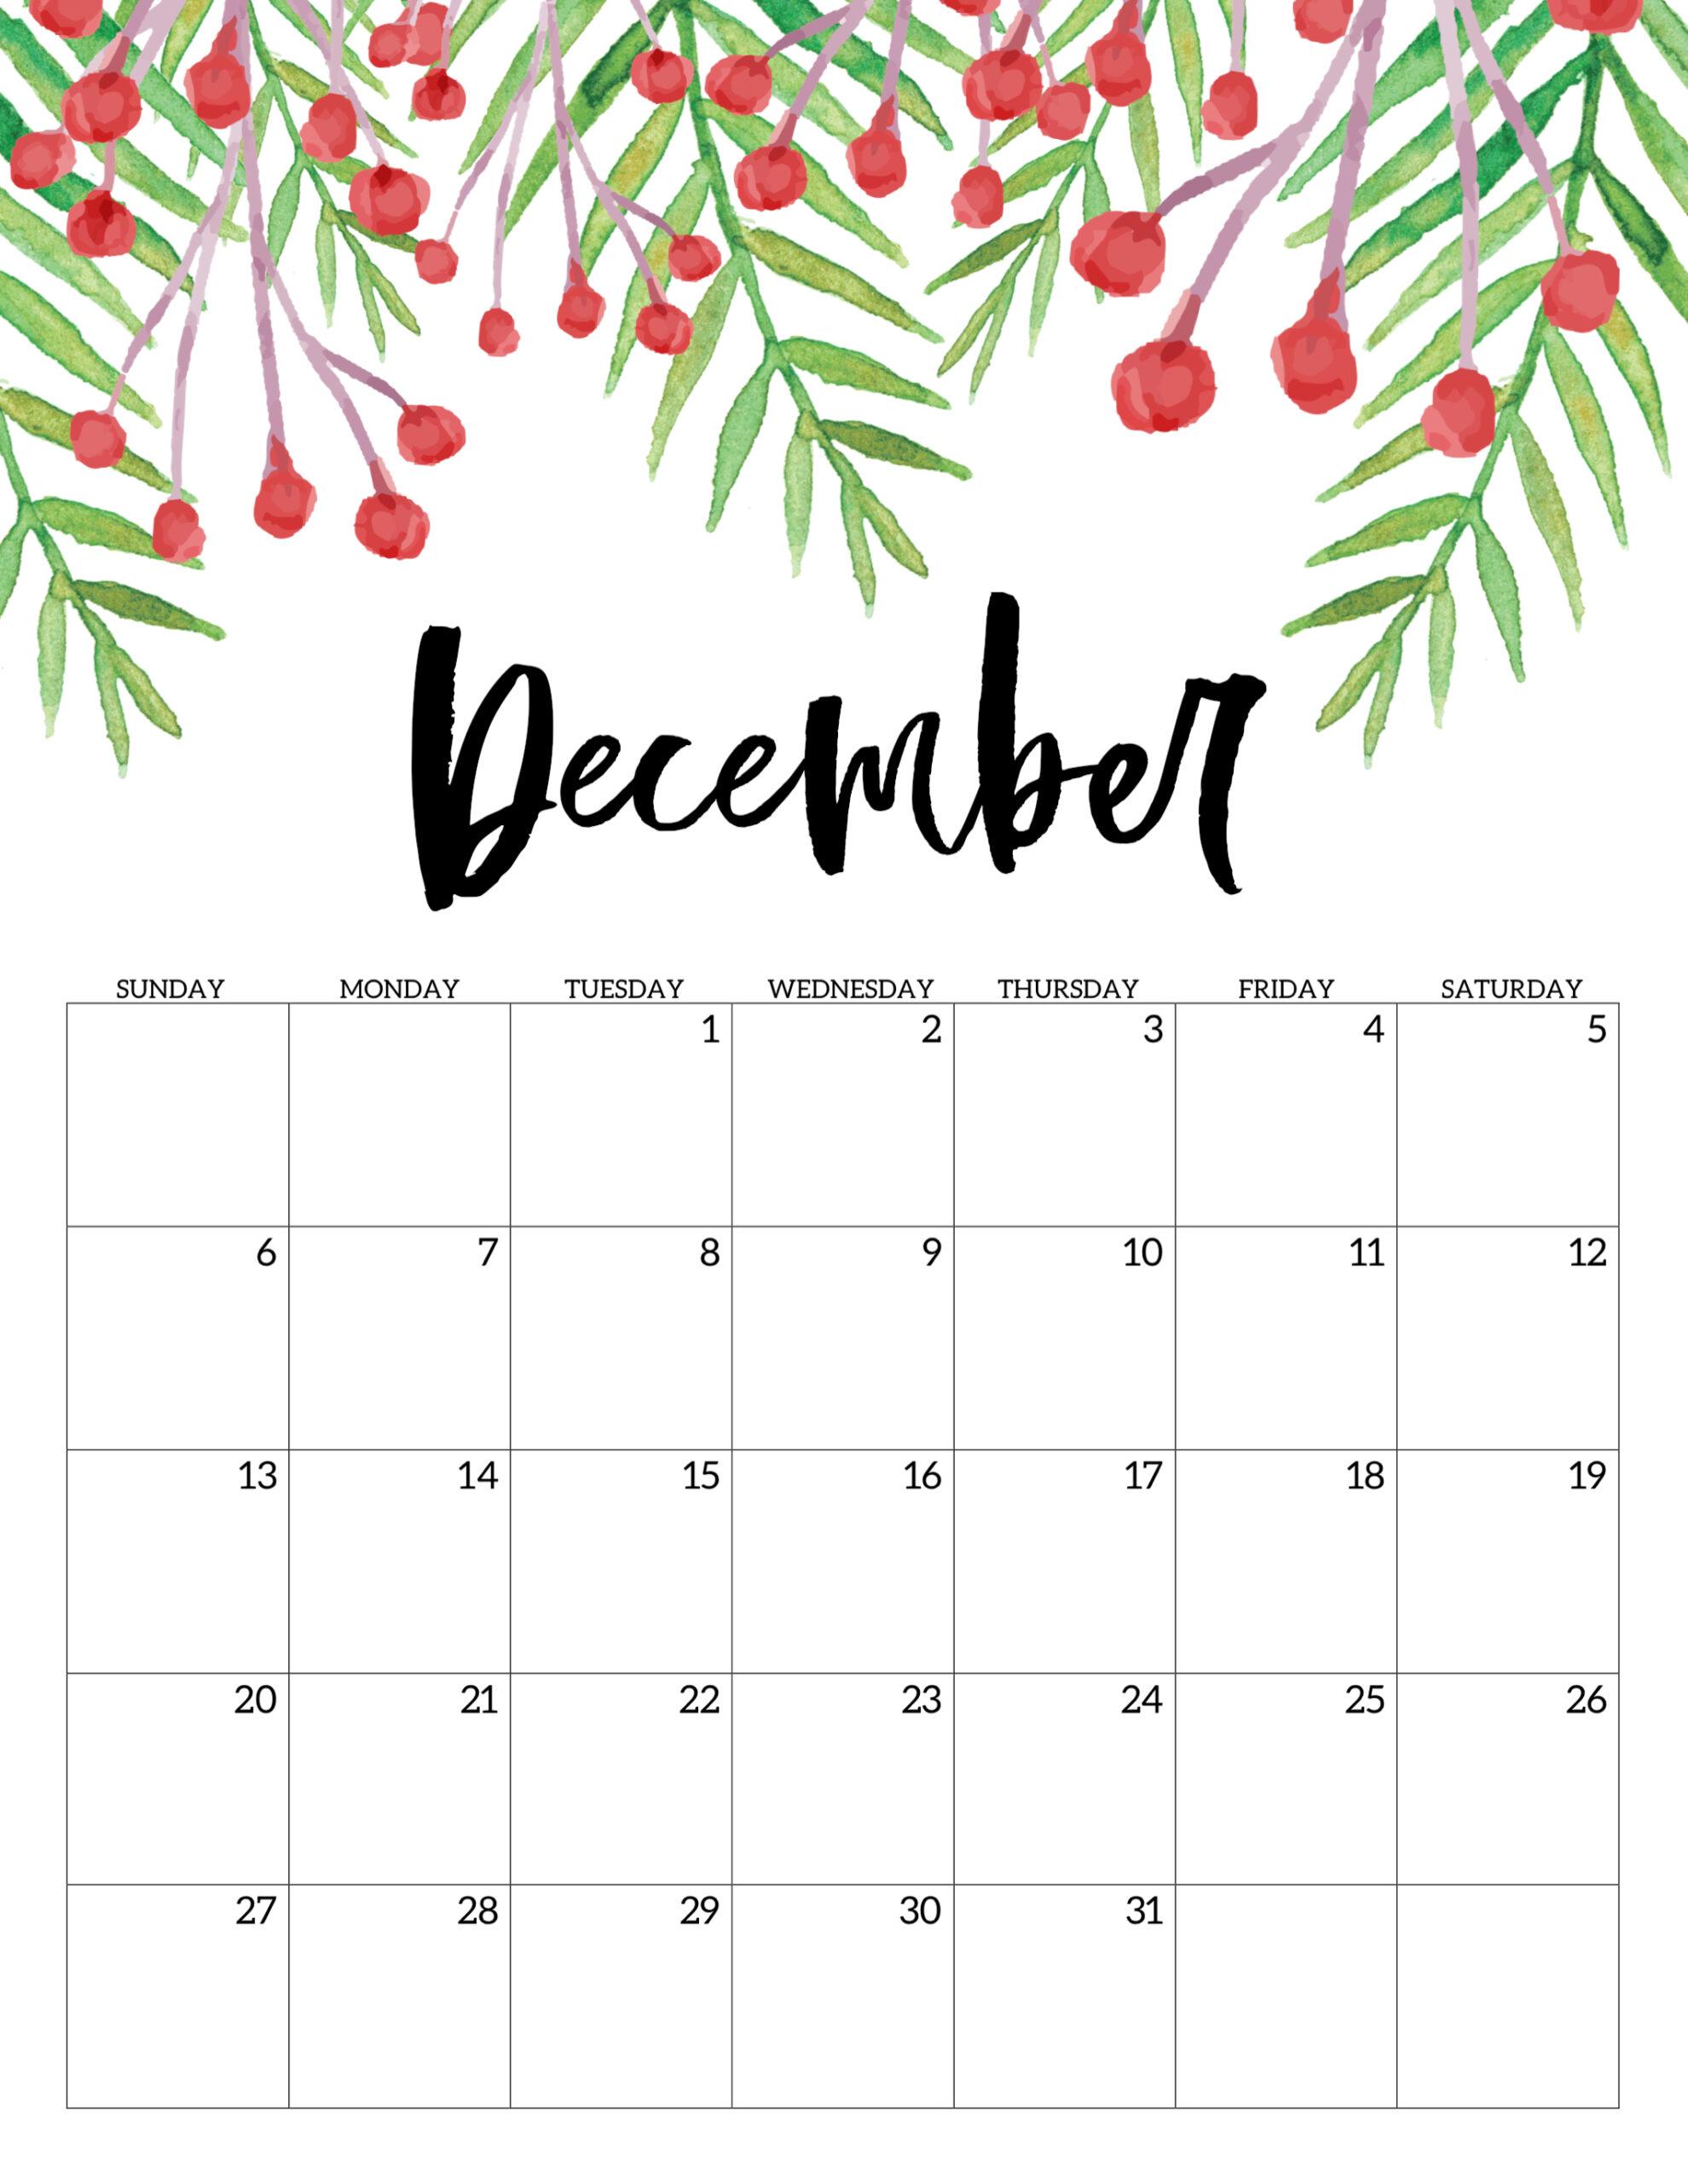 Free Printable Calendar 2020 - Floral - Paper Trail Design